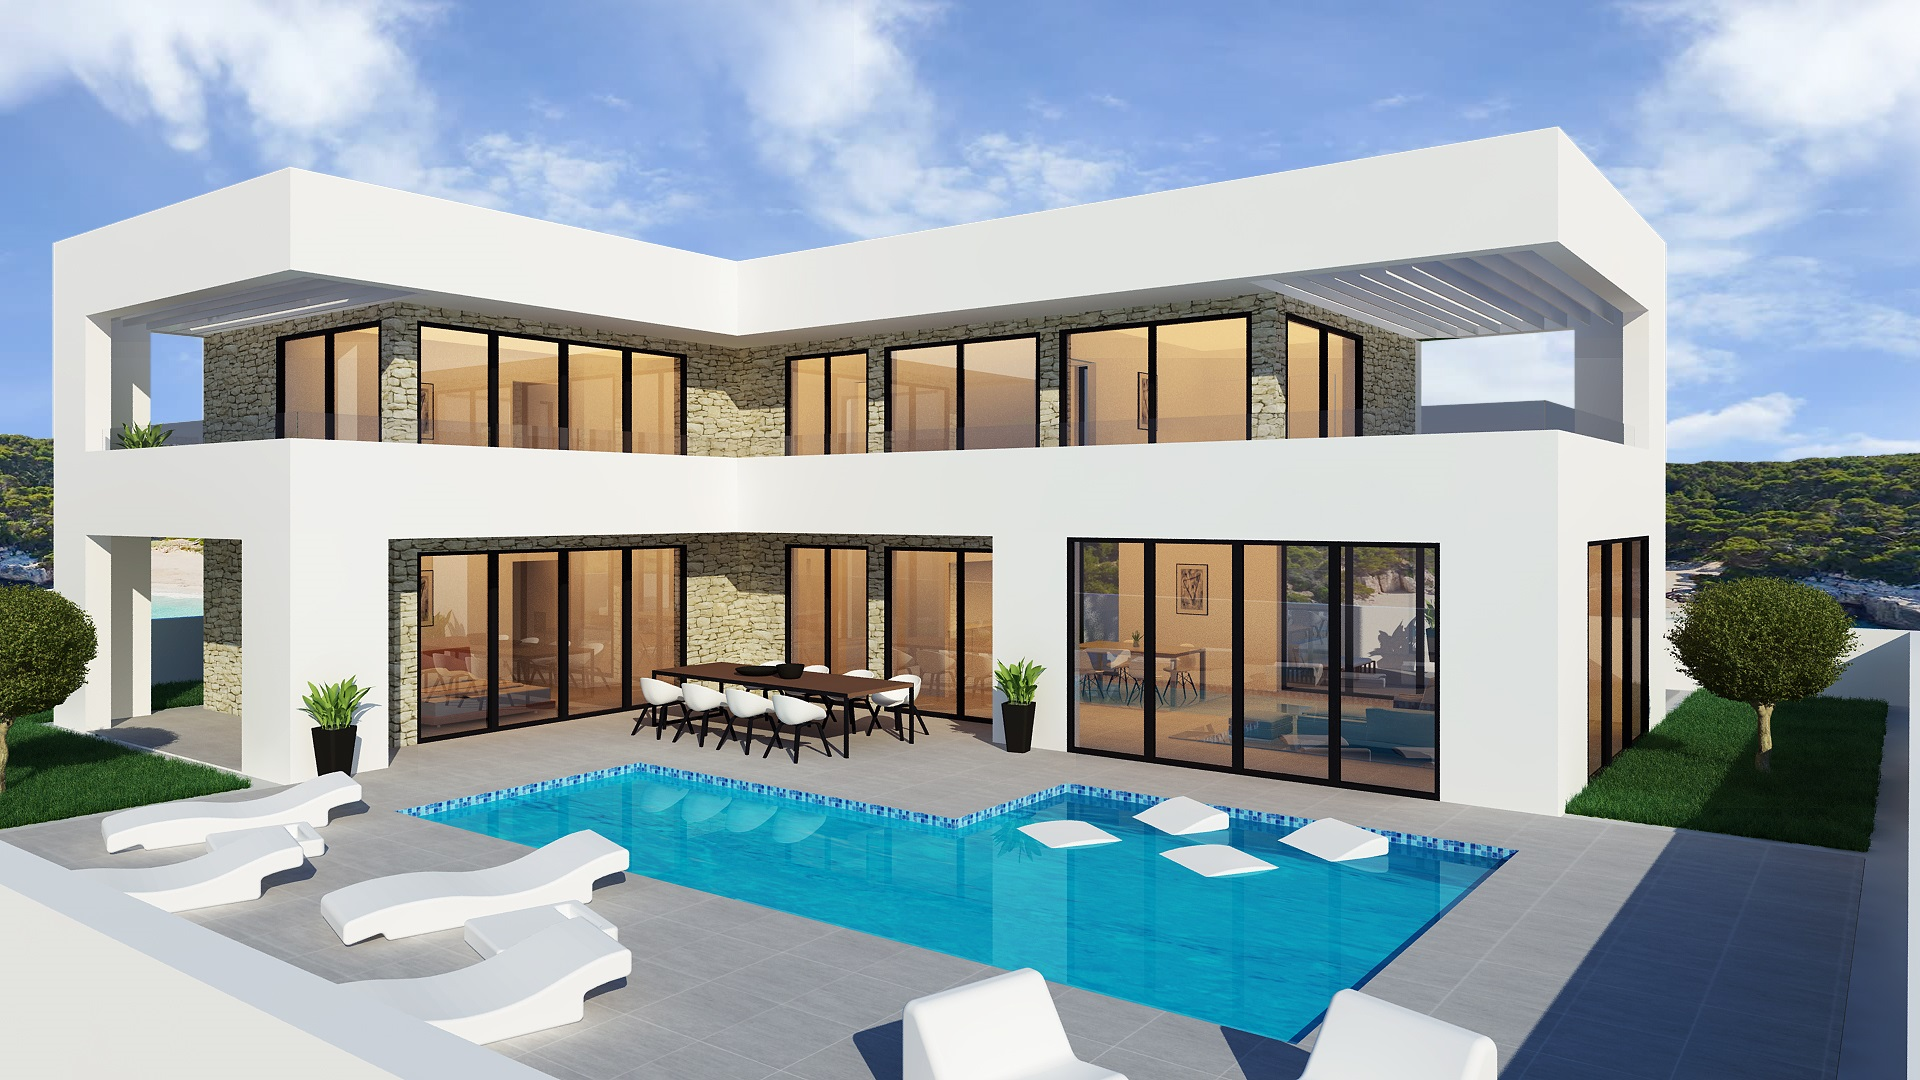 4 bedroom villa for sale, Santa Ponsa, Palma, Mallorca